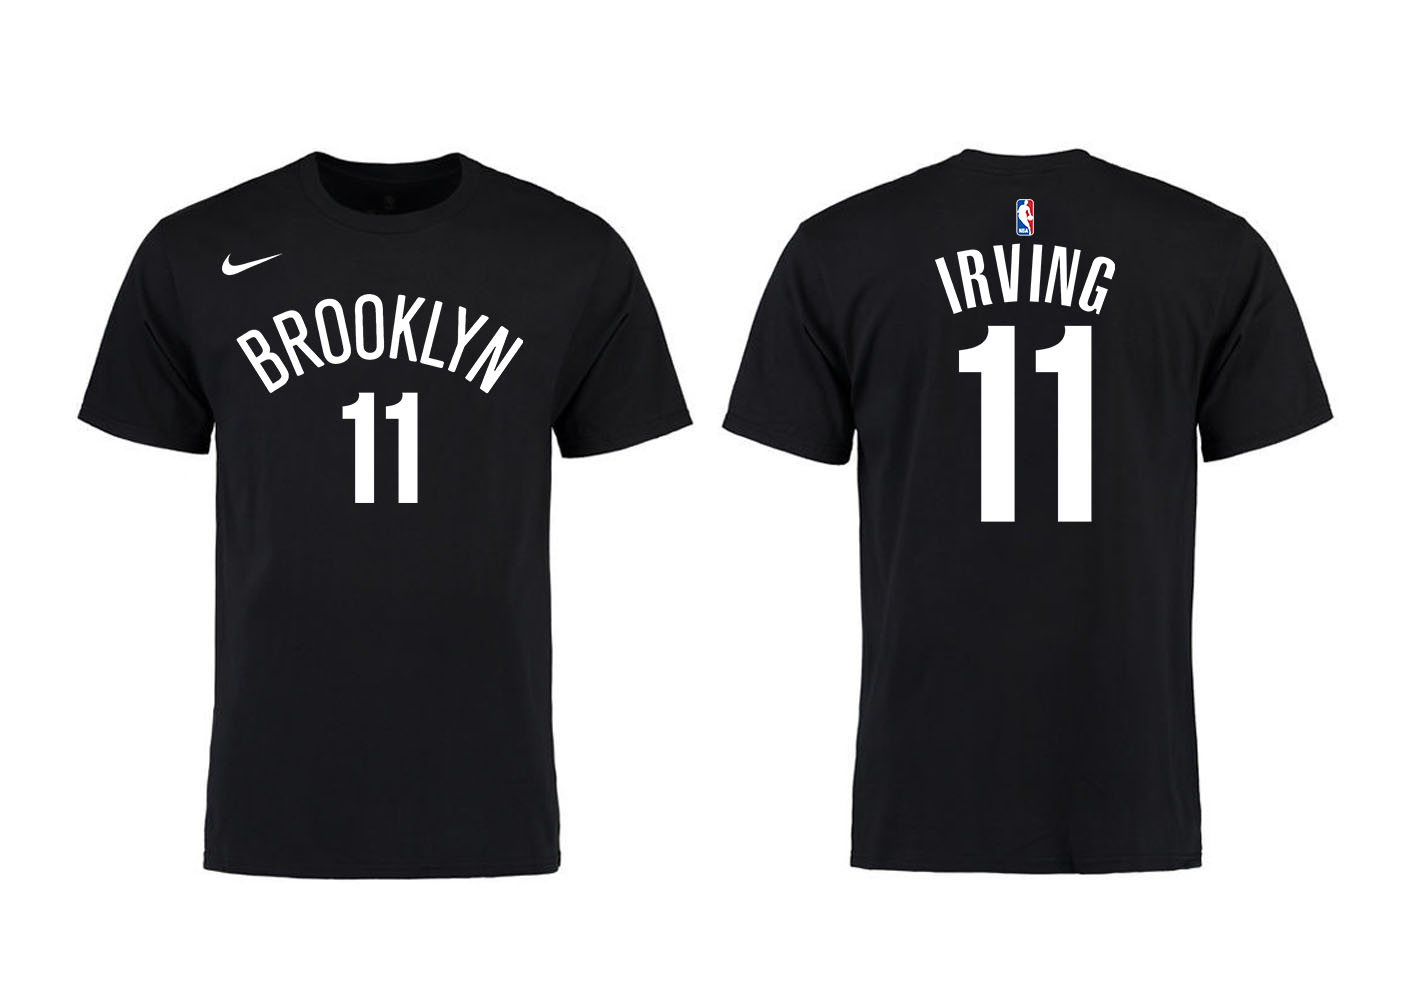 Brooklyn Nets 11 Kyrie Irving Black Nike T-Shirt